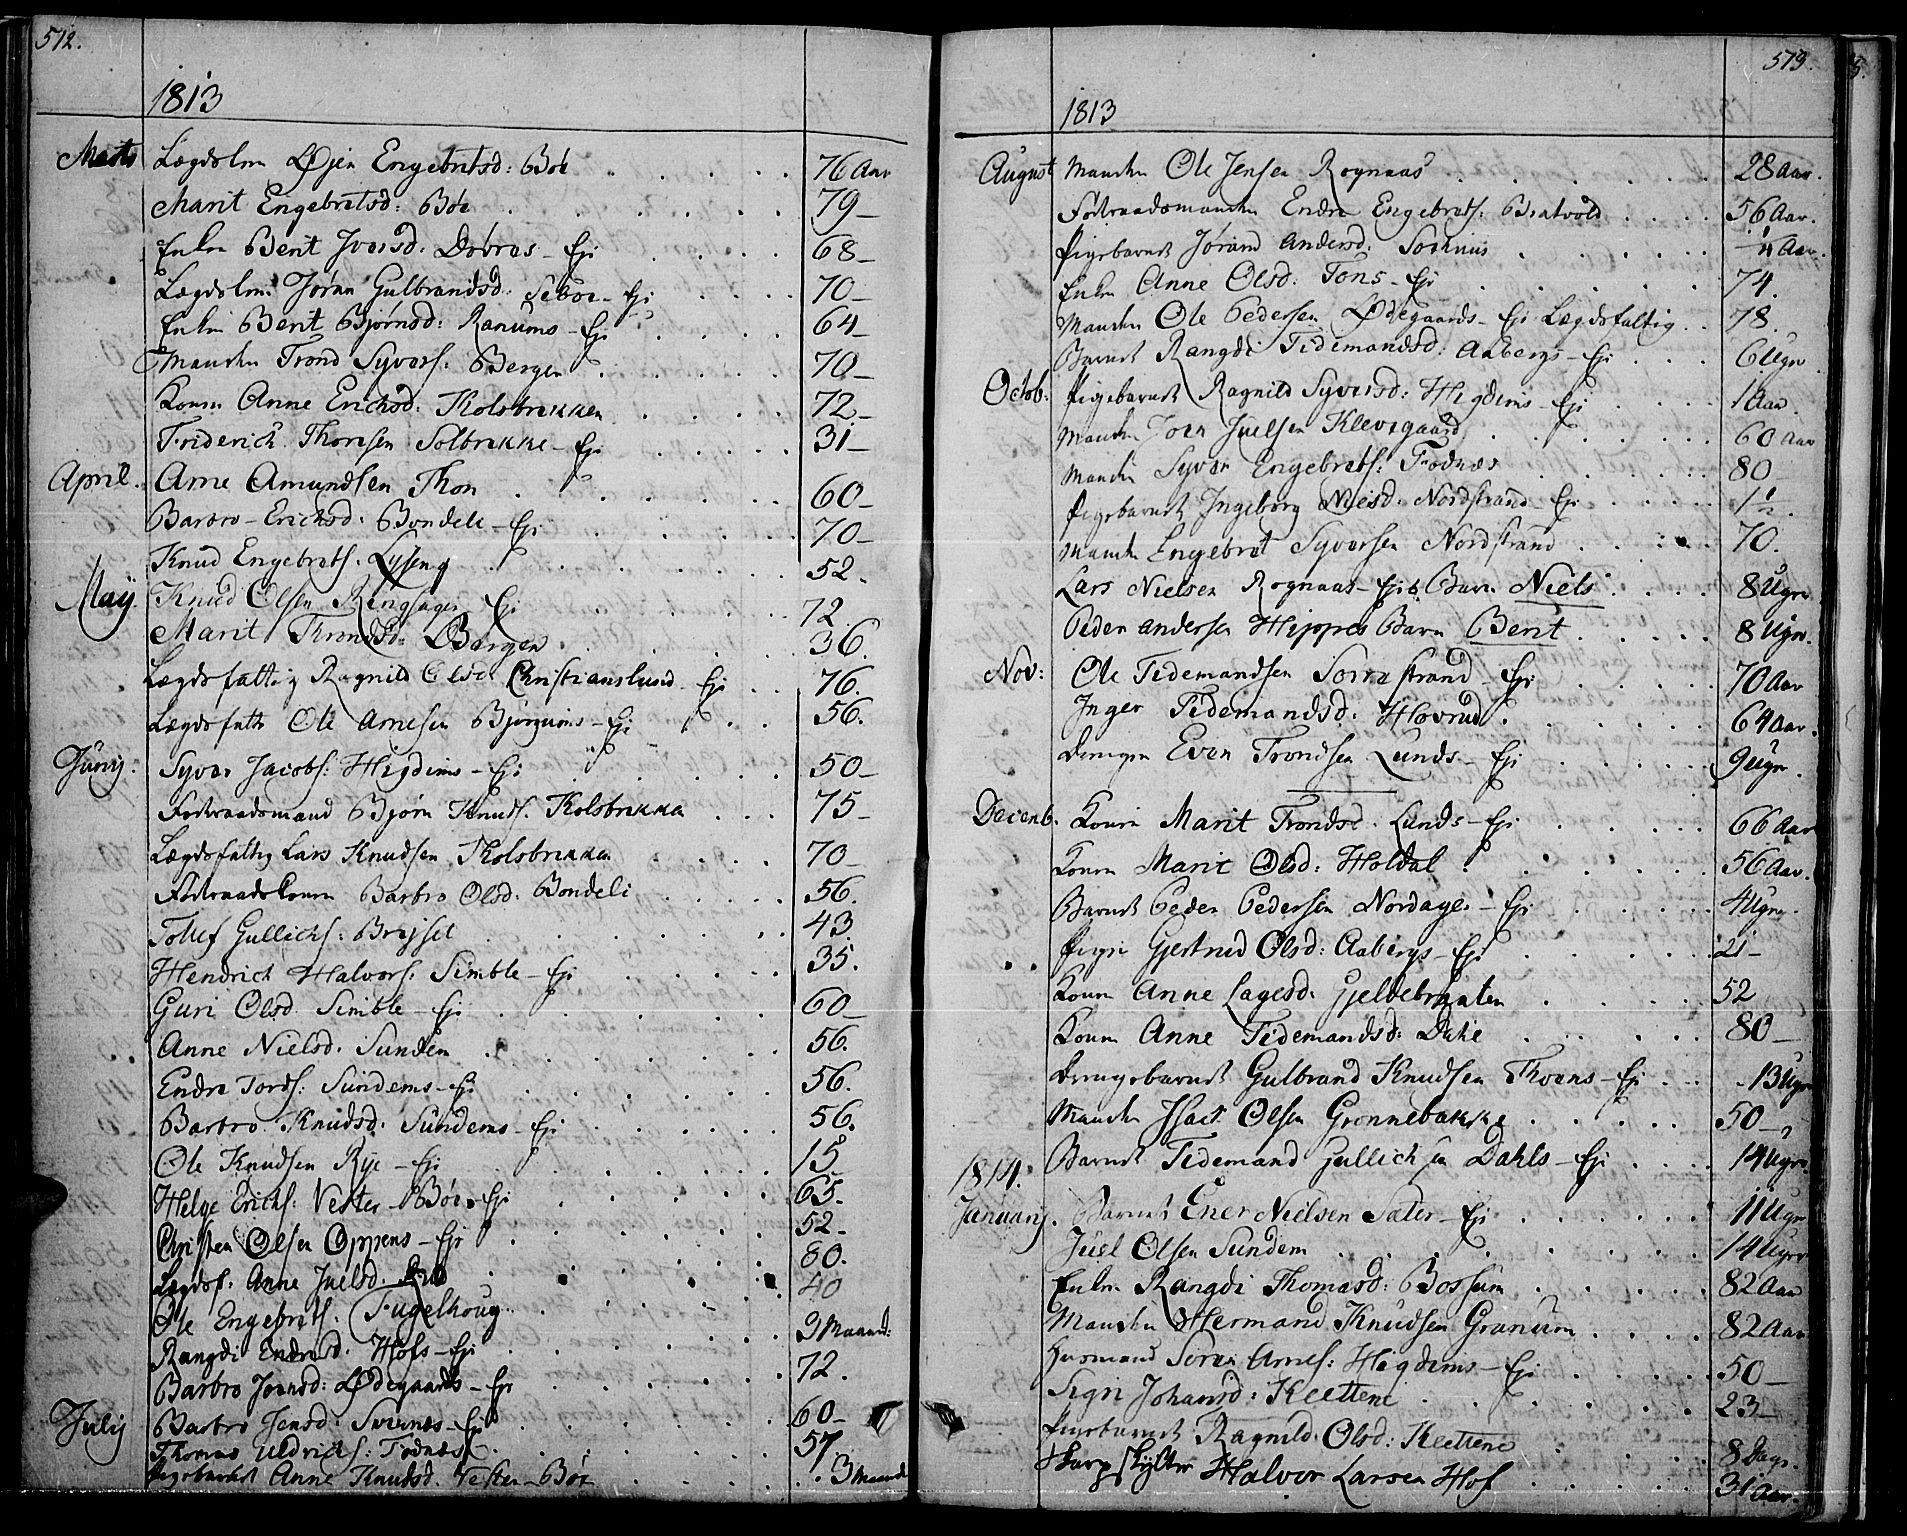 SAH, Nord-Aurdal prestekontor, Ministerialbok nr. 1, 1808-1815, s. 512-513